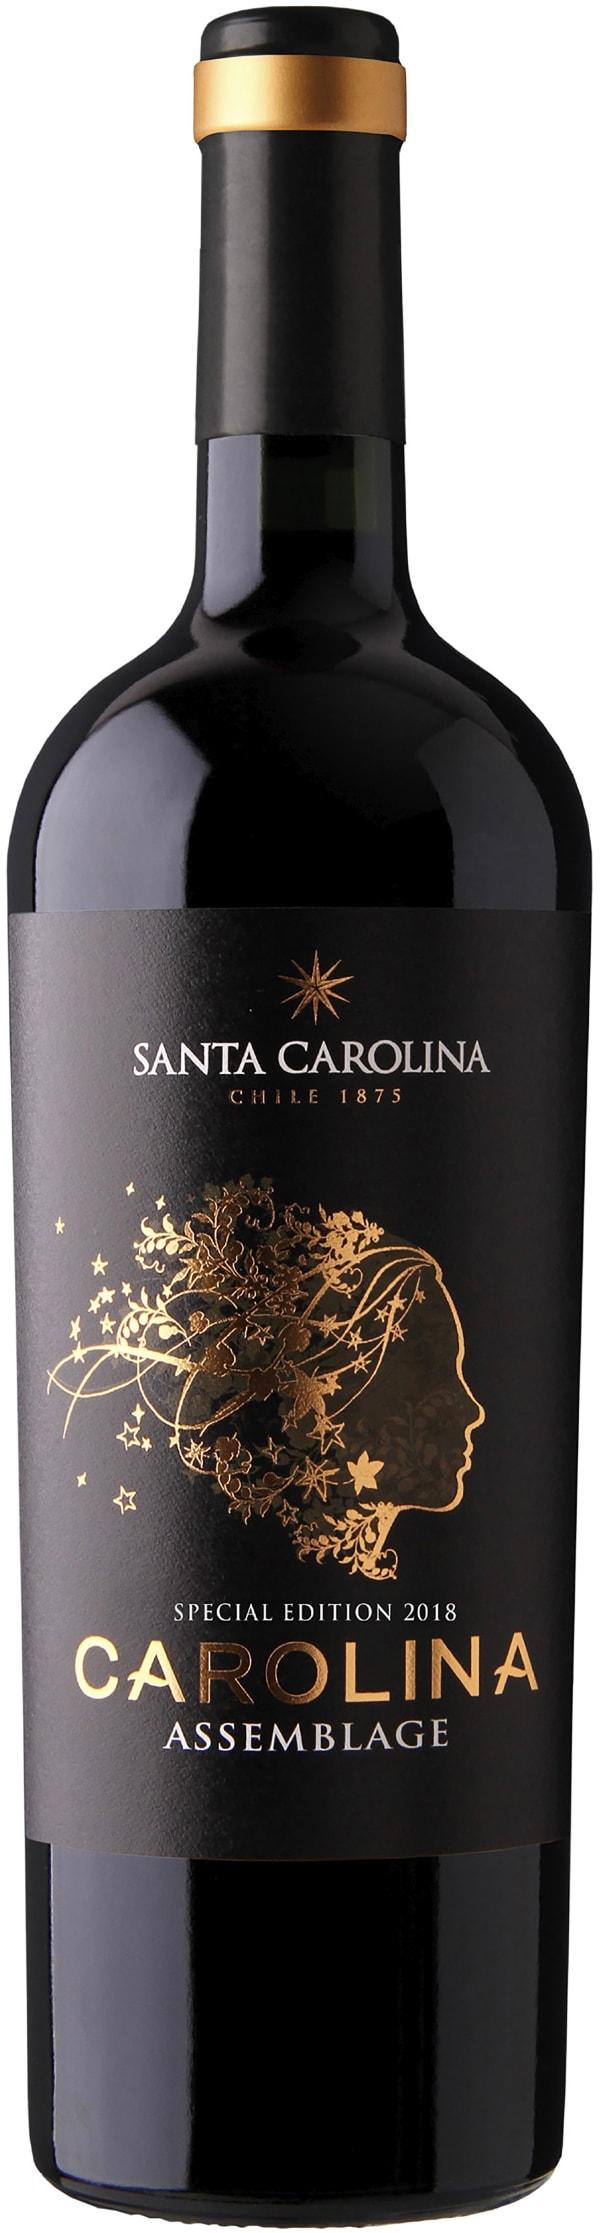 Santa Carolina Assemblage Special Edition 2018